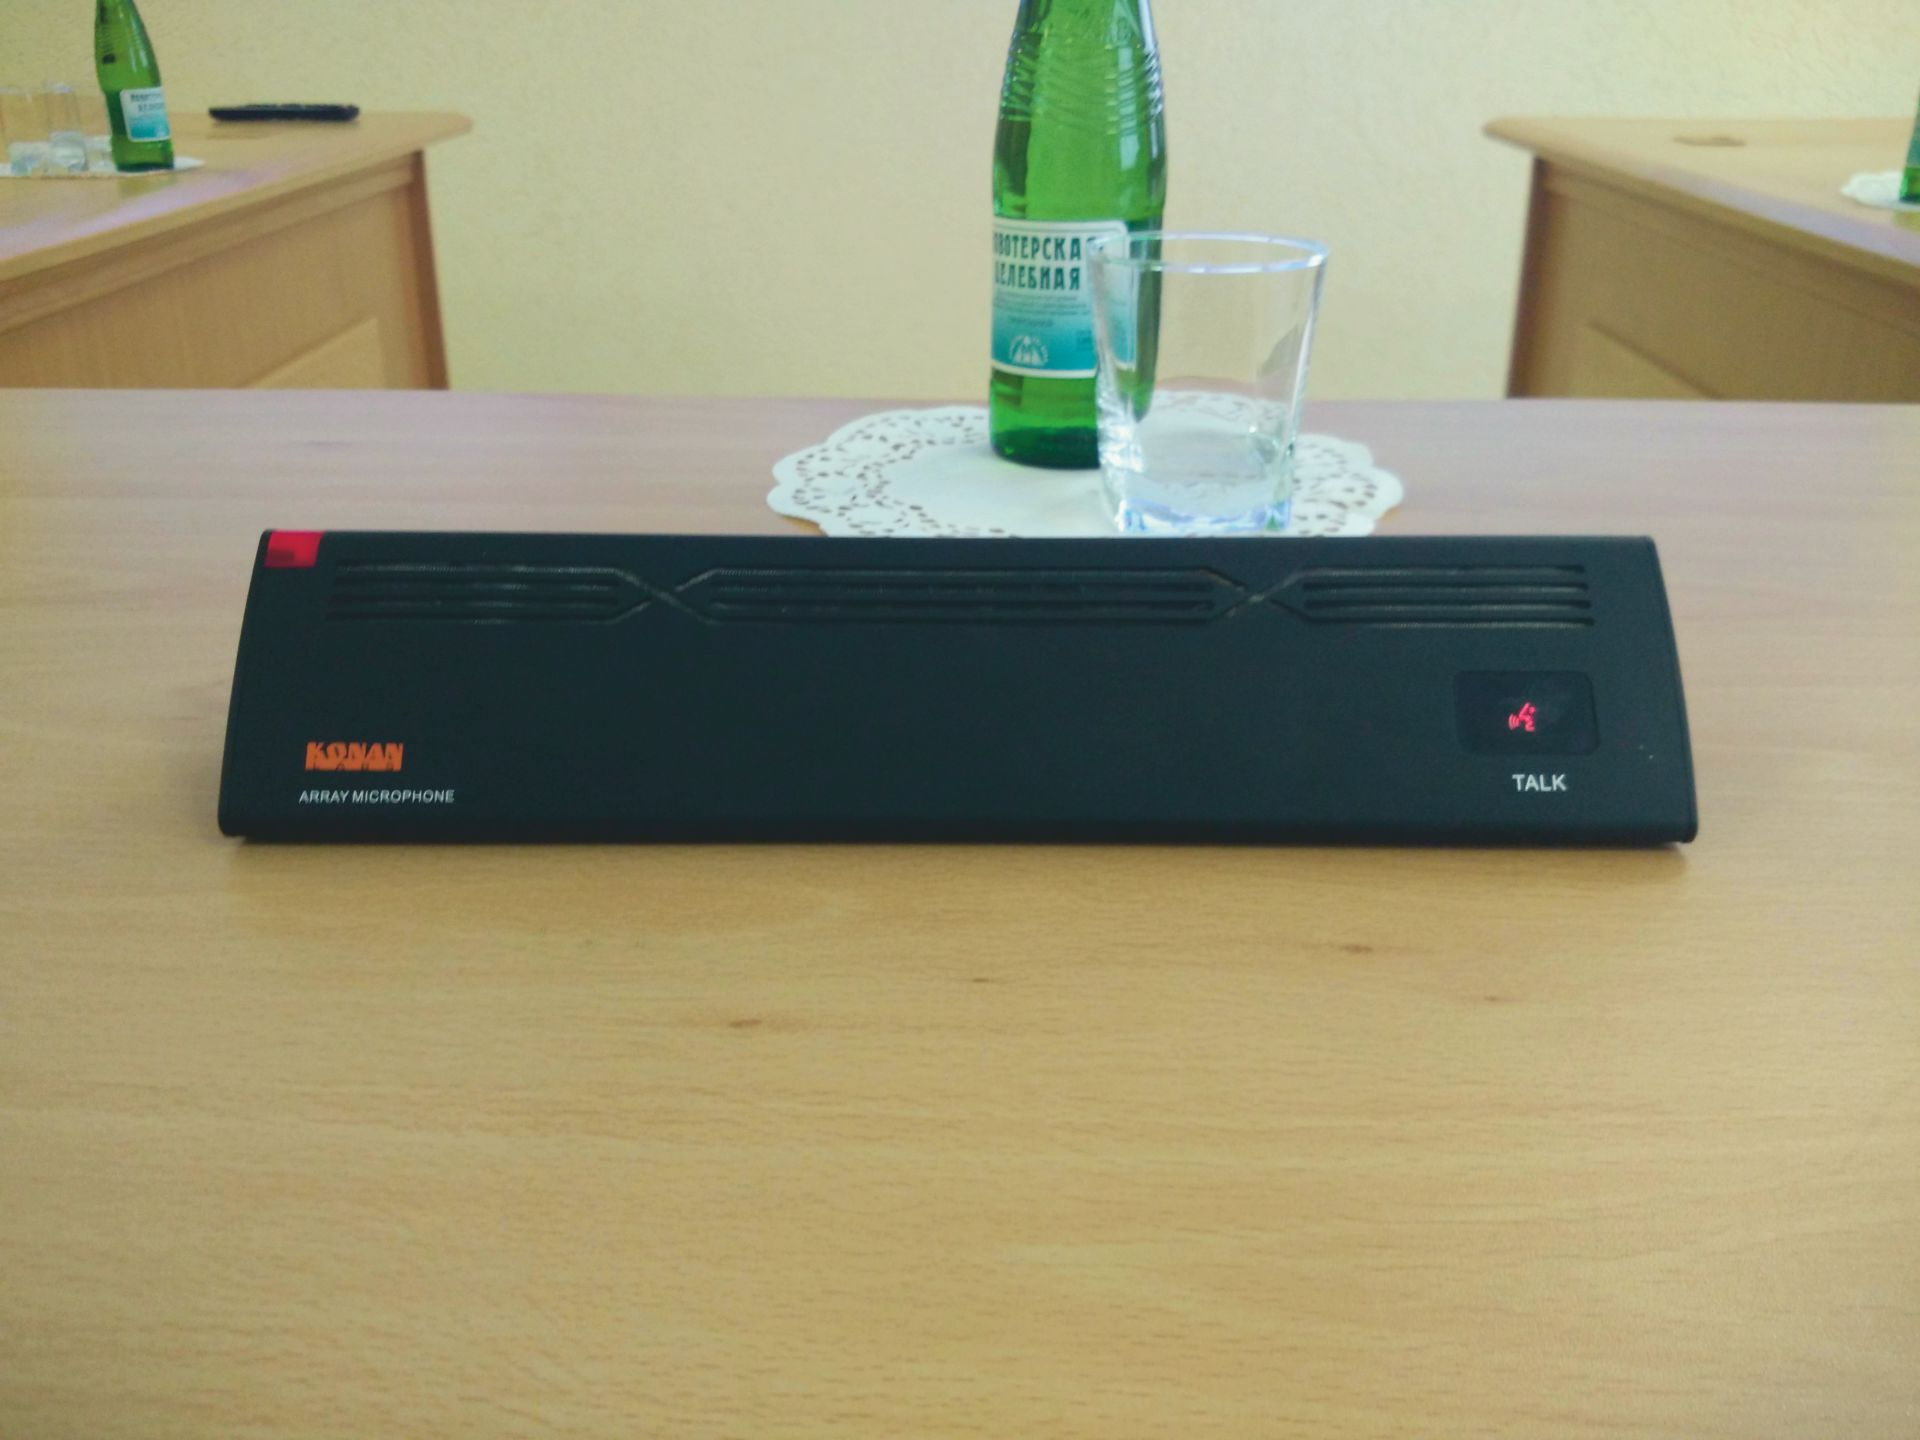 Переговорная комната с системой видеоконференцсвязи